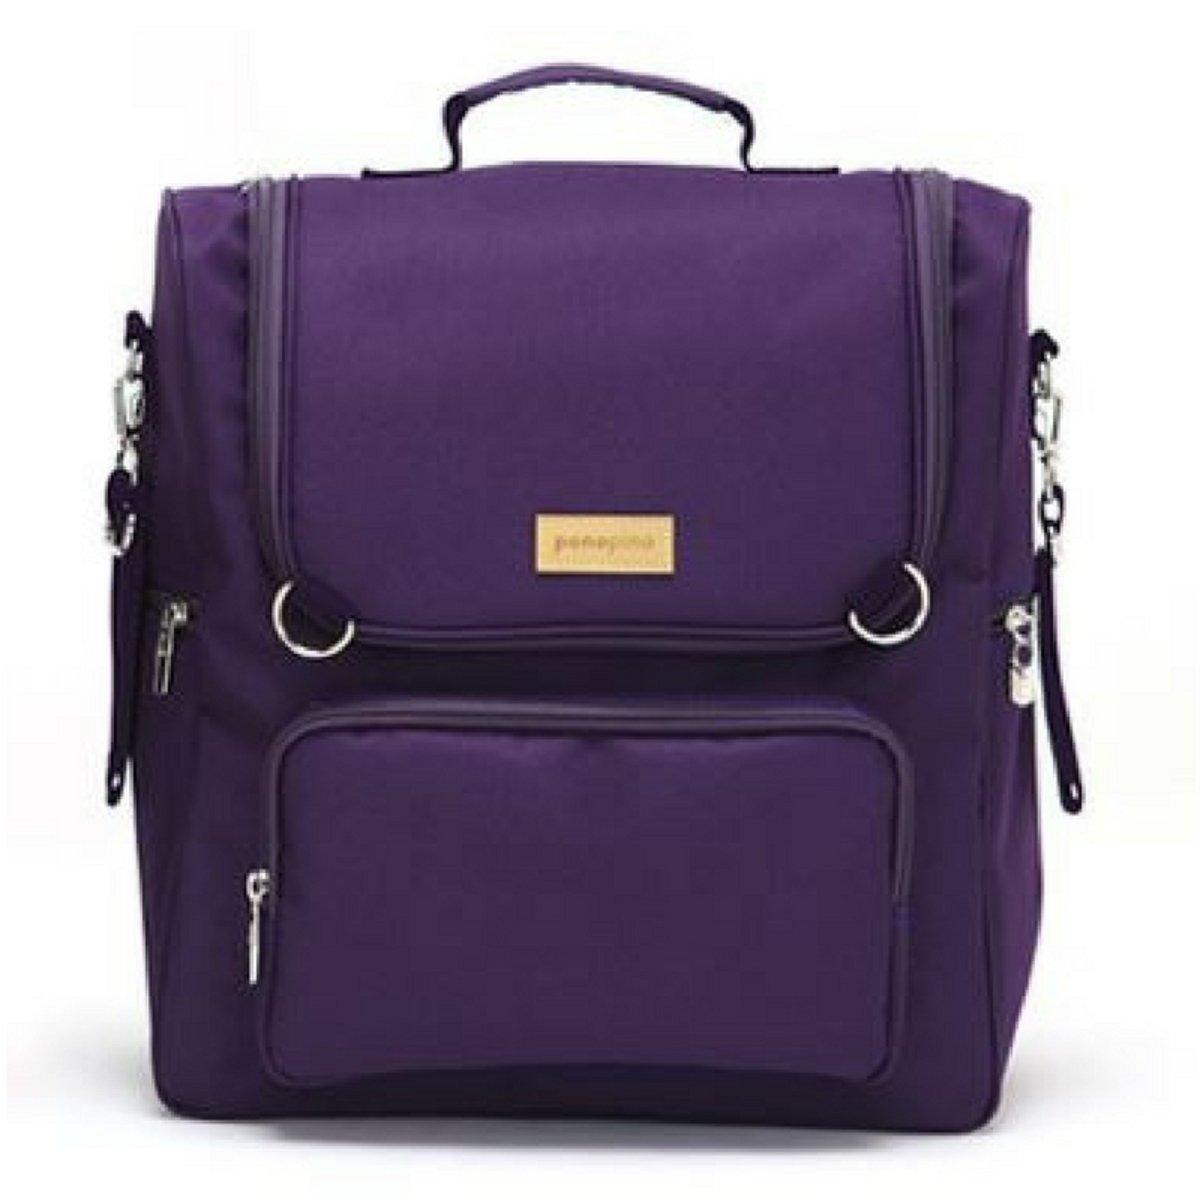 Ponopino防水背囊 (紫色)_Premium3